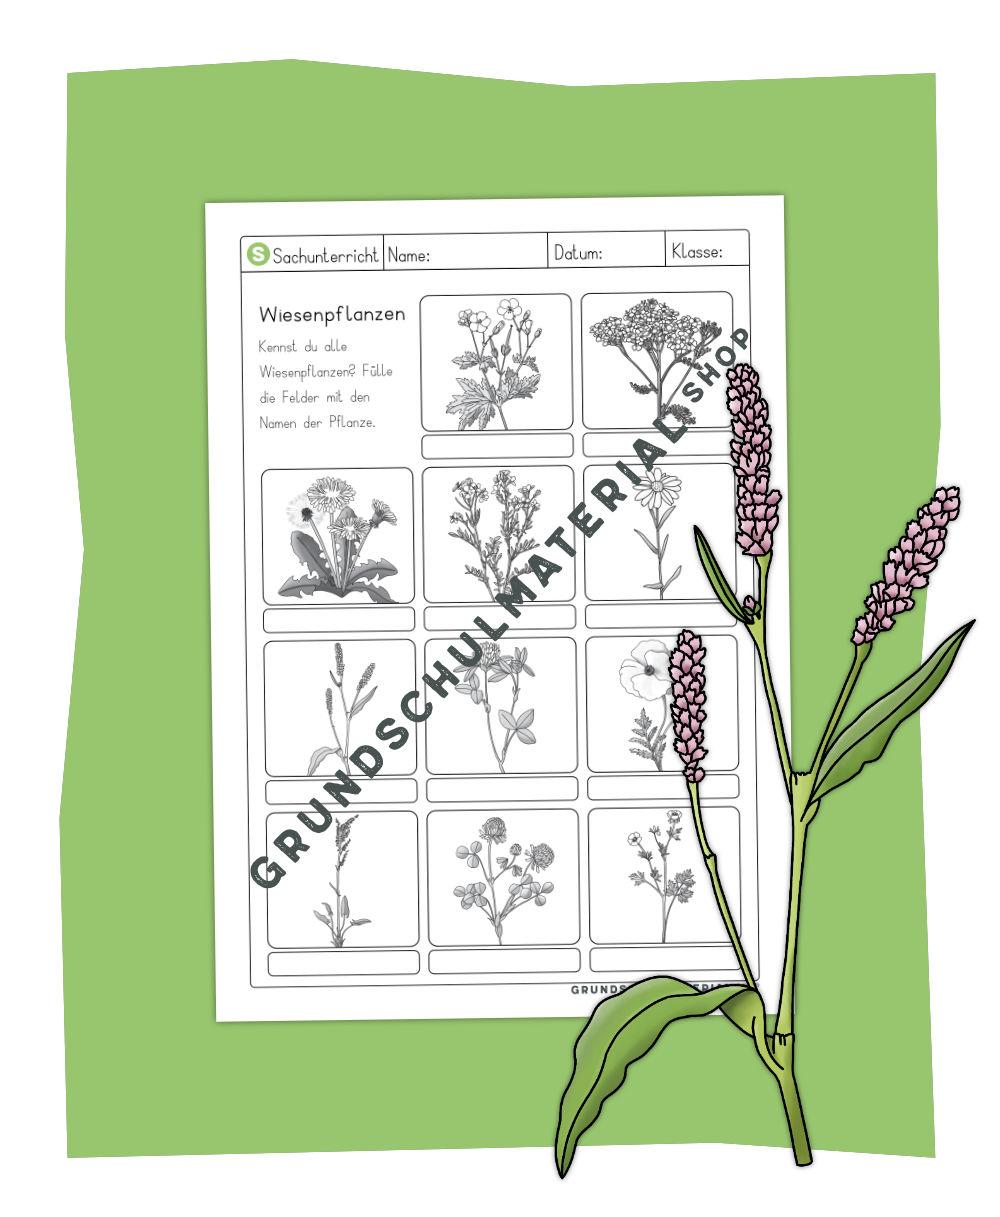 Wiesenpflanzen Arbeitsblatt